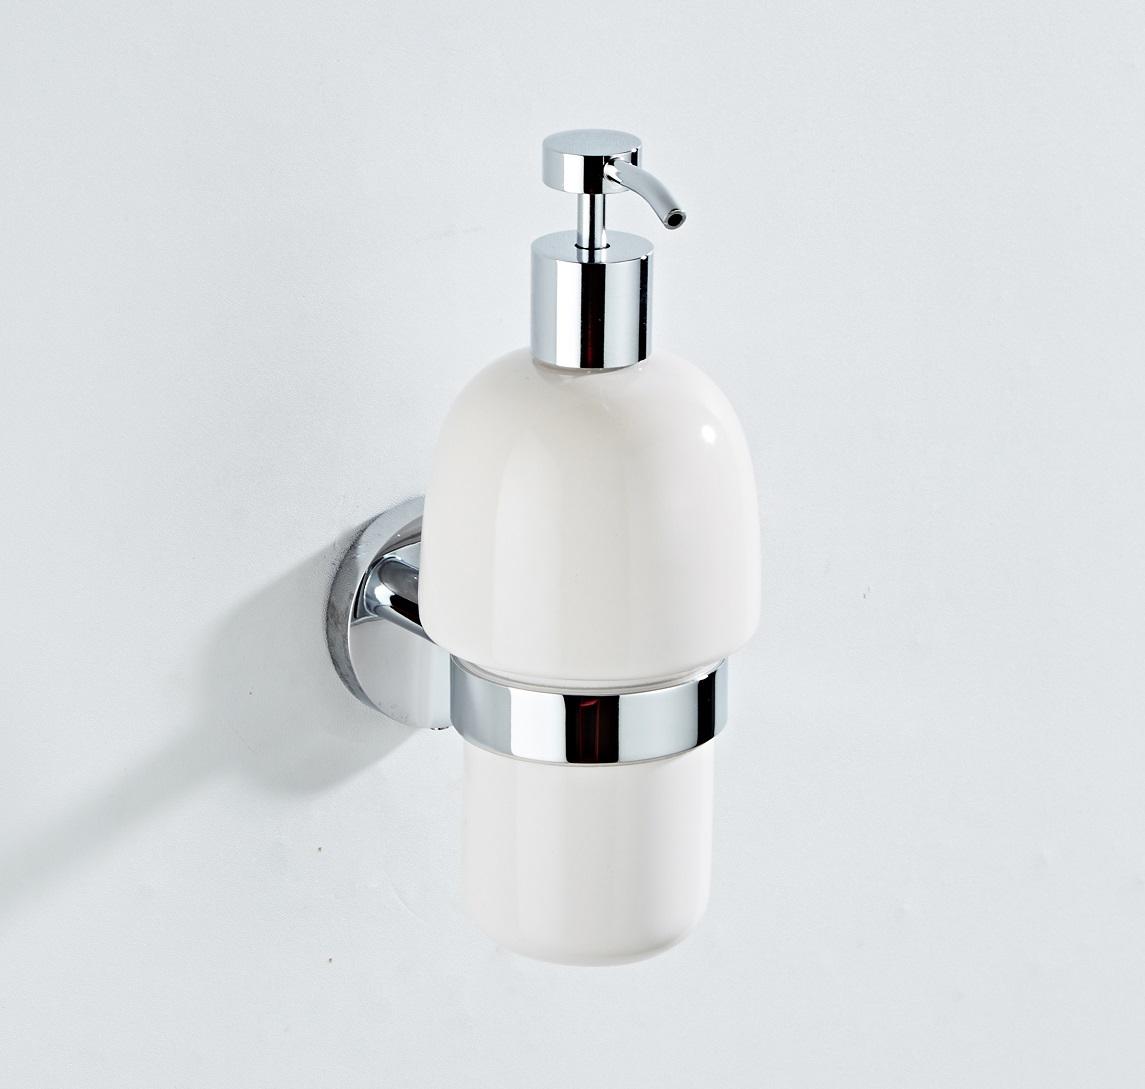 Saniclear Talpa zeepdispenser chroom